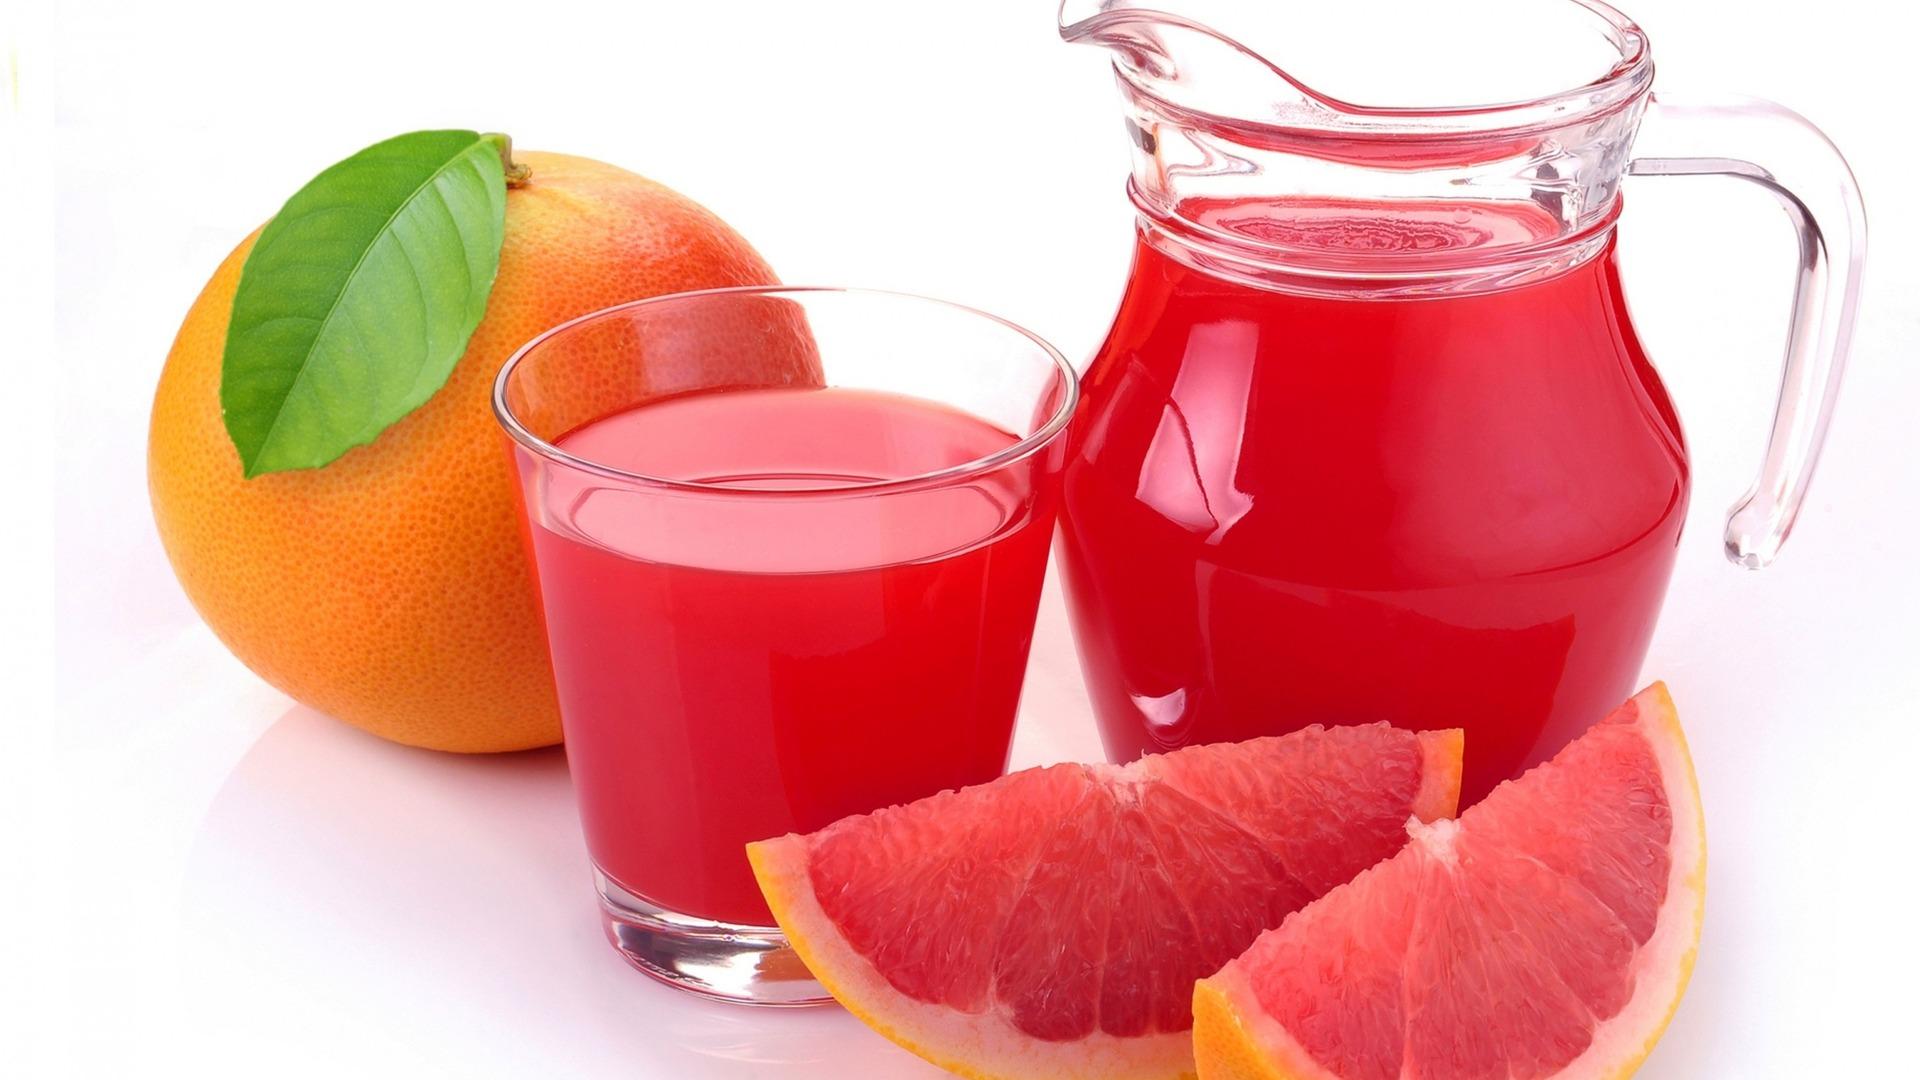 Download wallpaper 1920x1080 juice grapefruit citrus fruit 1920x1080